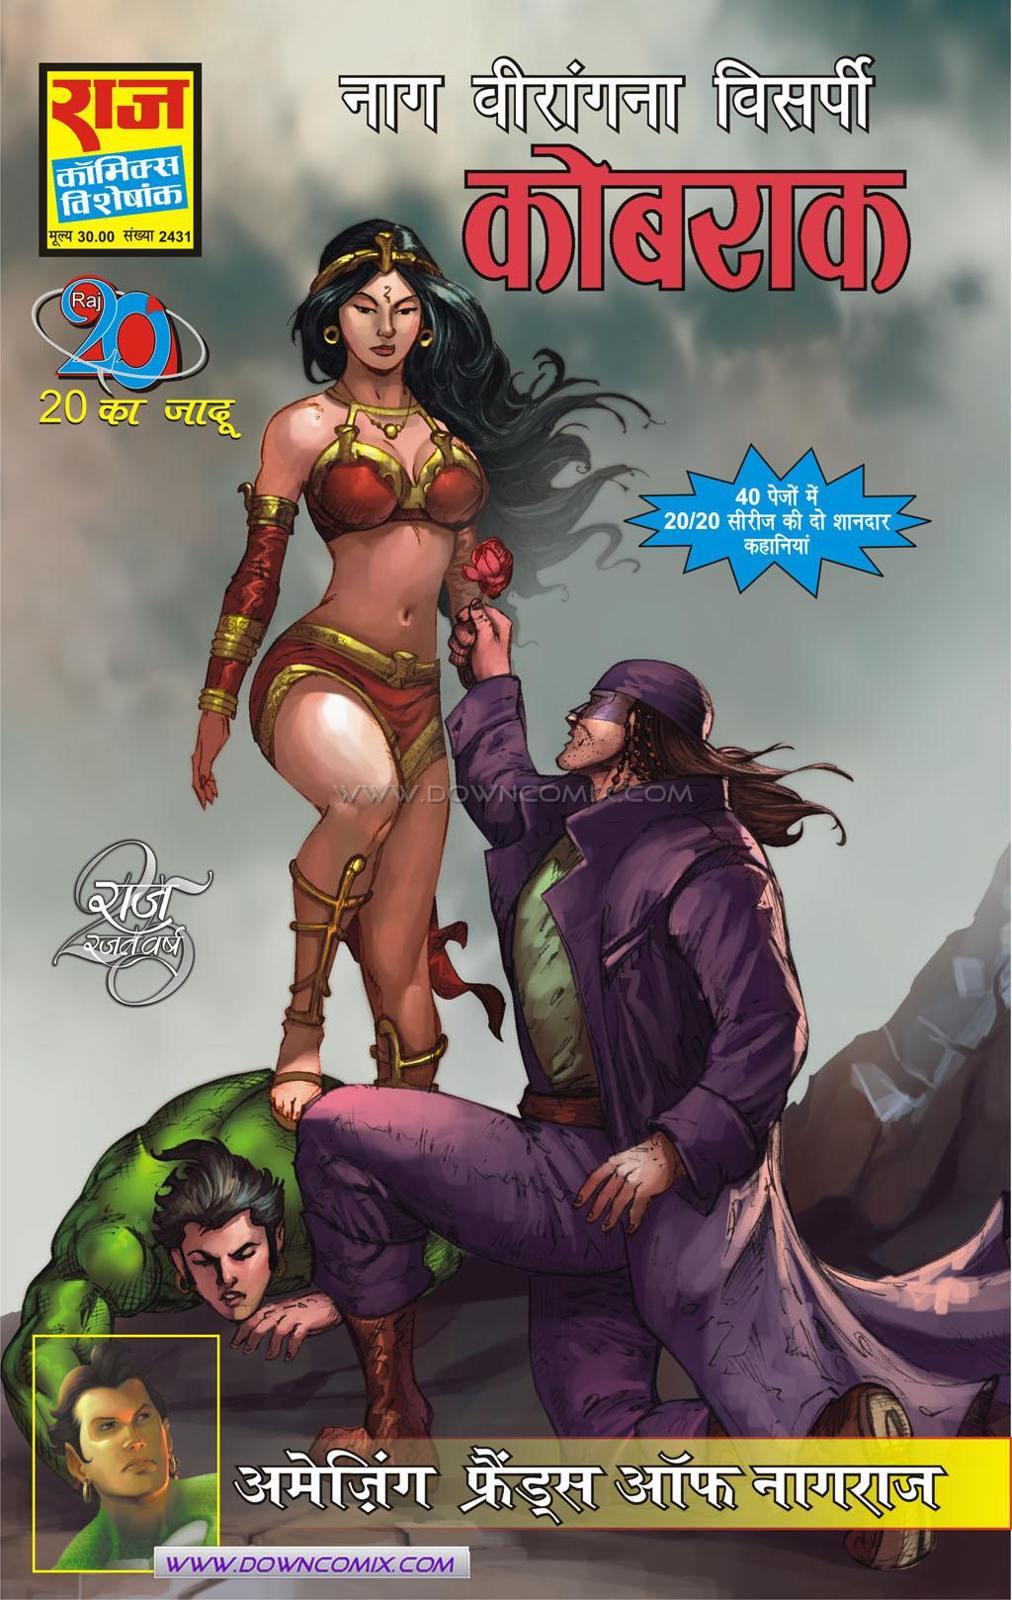 Amazing Friends of Nagraj | Downcomix com:Hindi Comics,Raj Comics